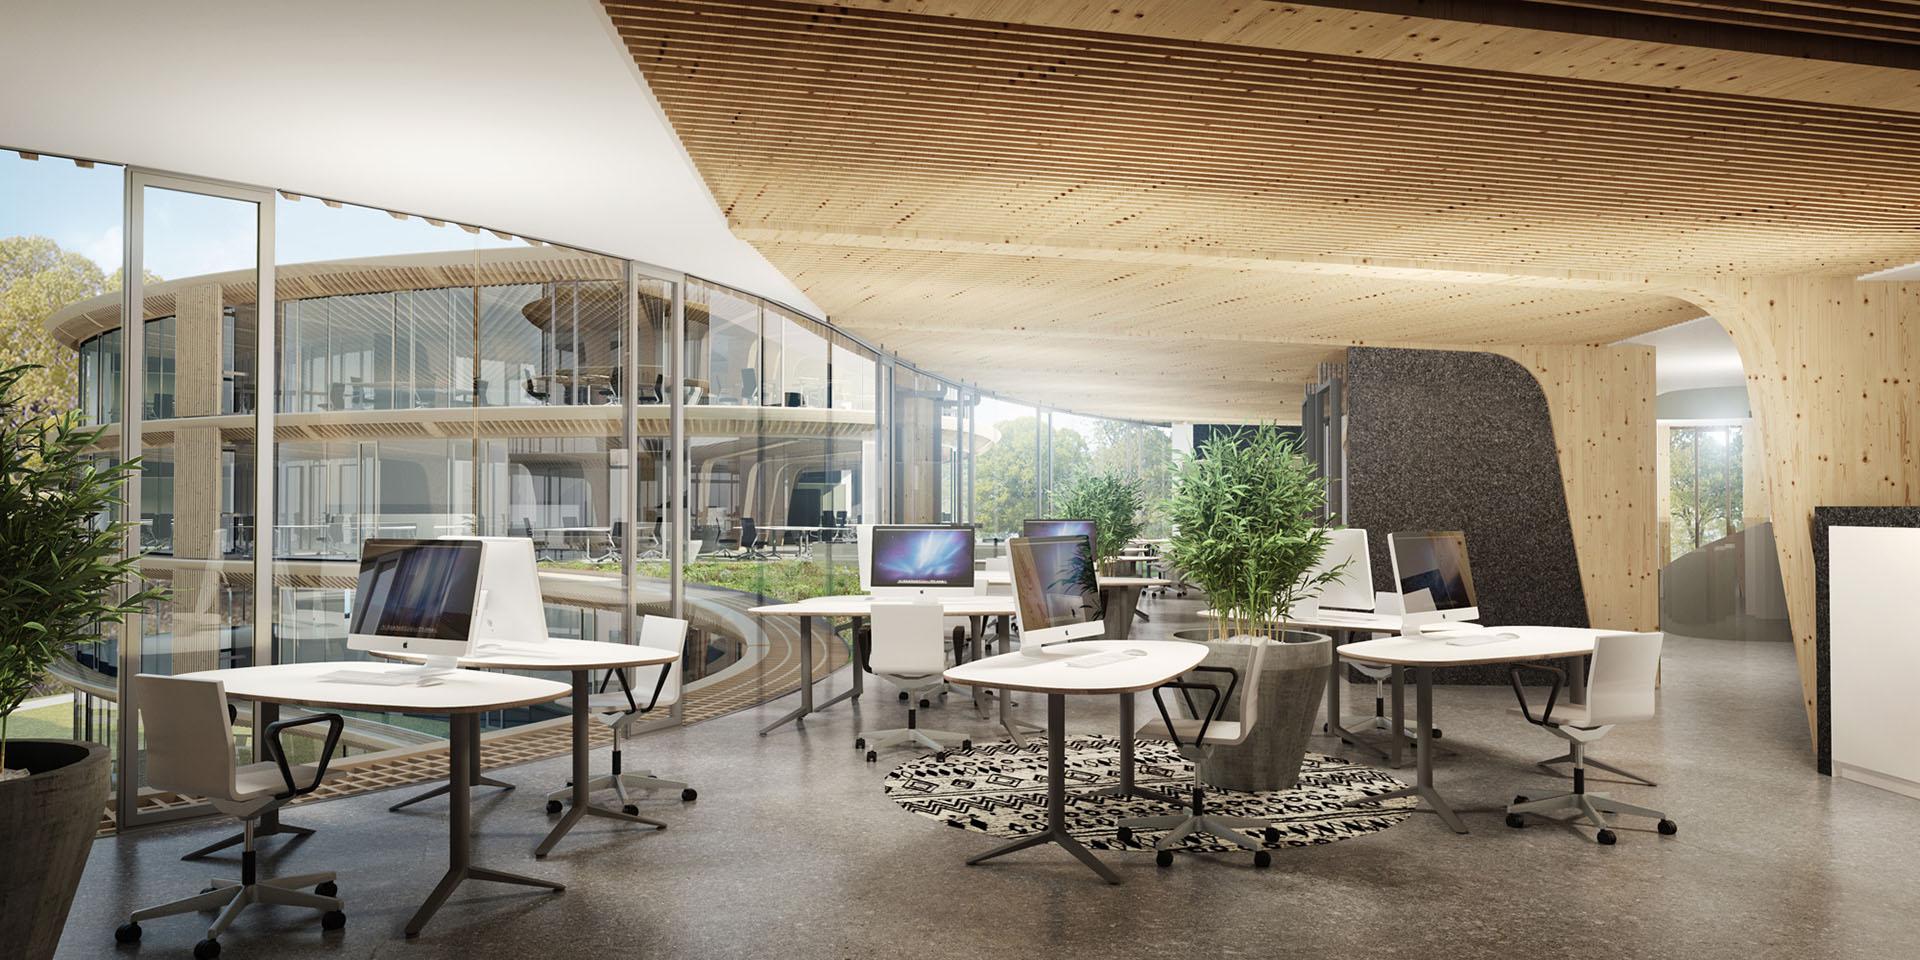 3_RAU003_1 - RAU architecten - Triodos_Interieur_Kantoor